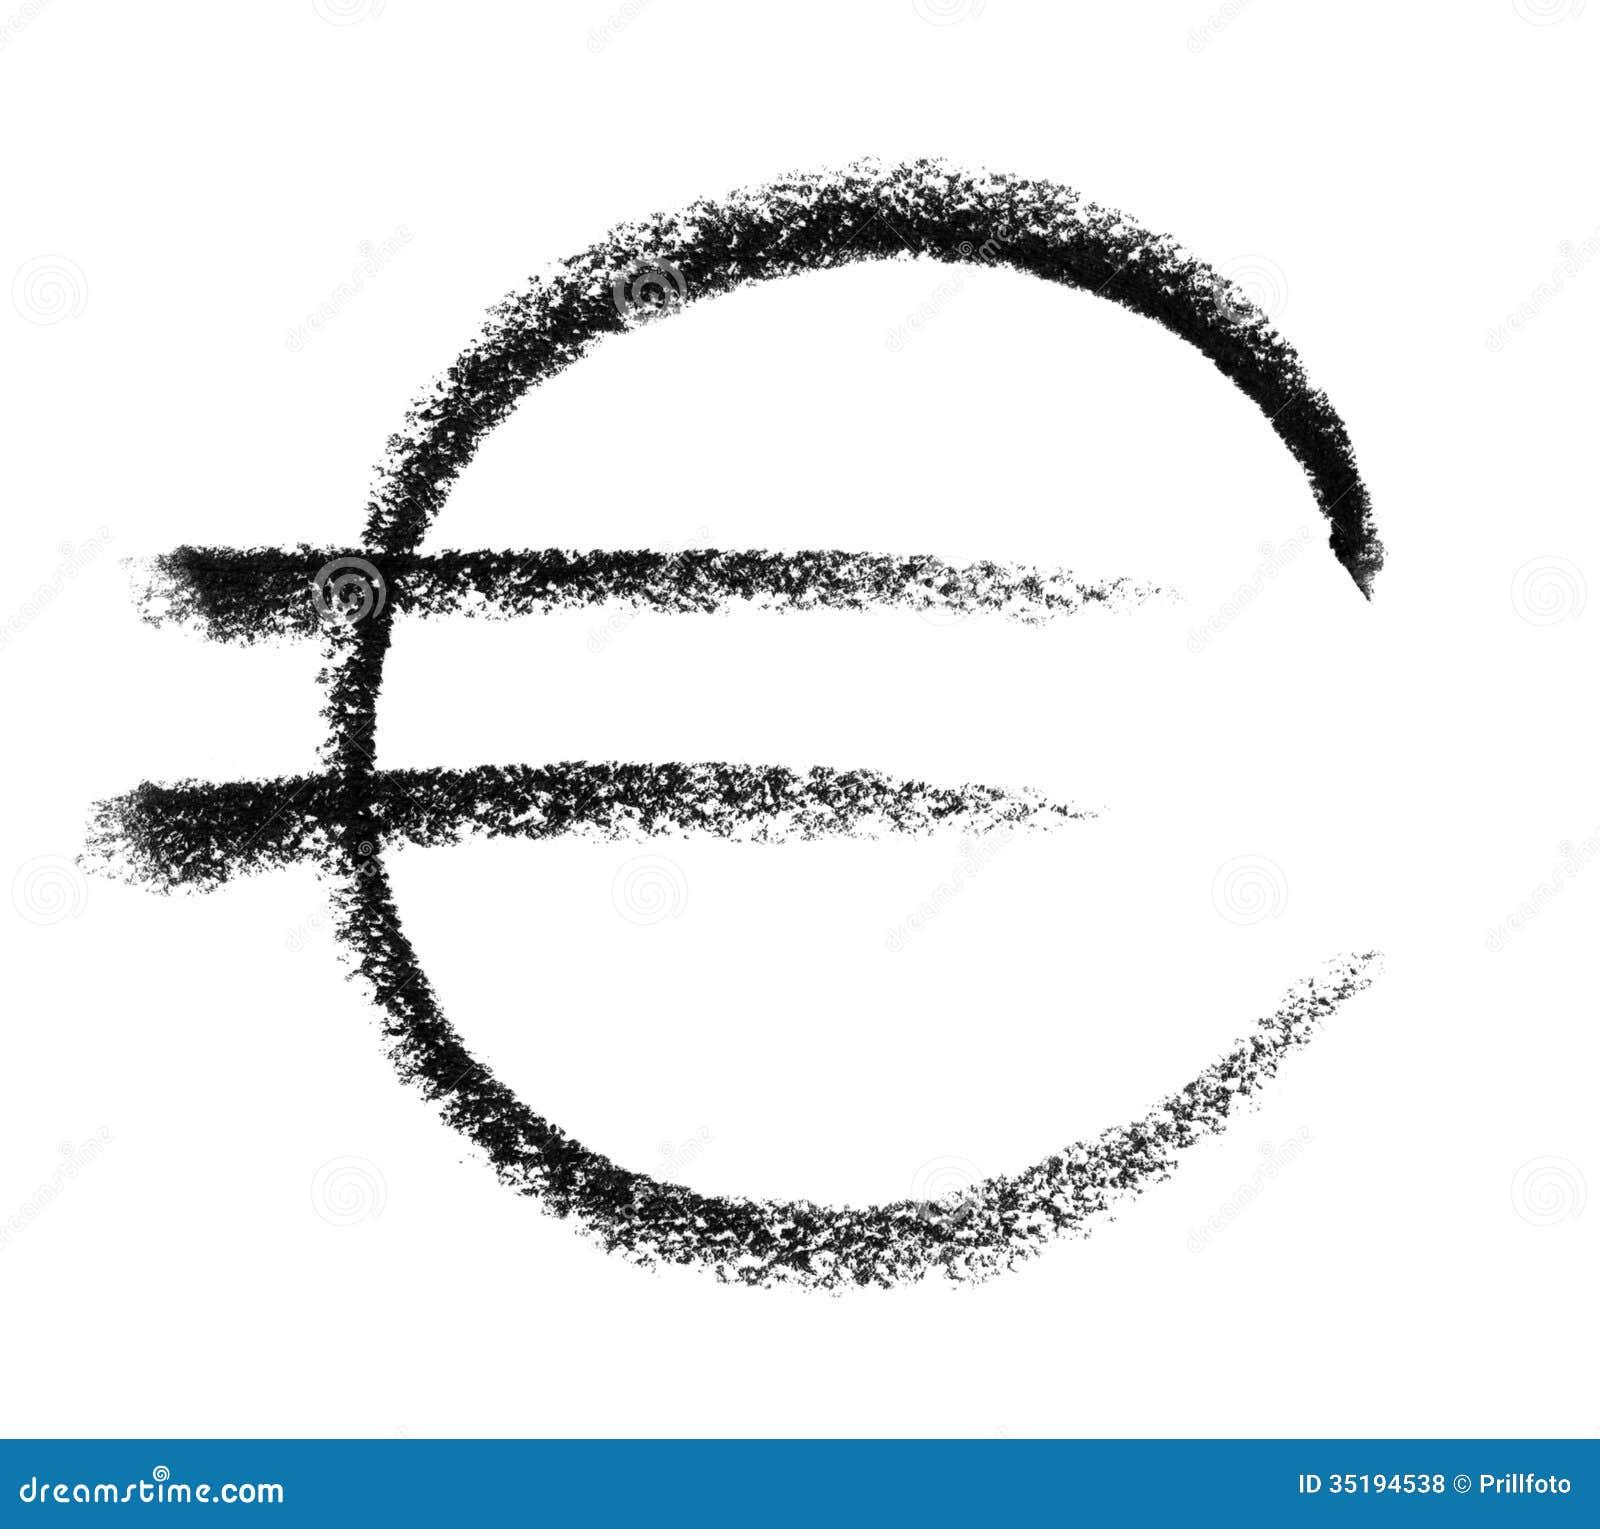 how to draw nsx symbol